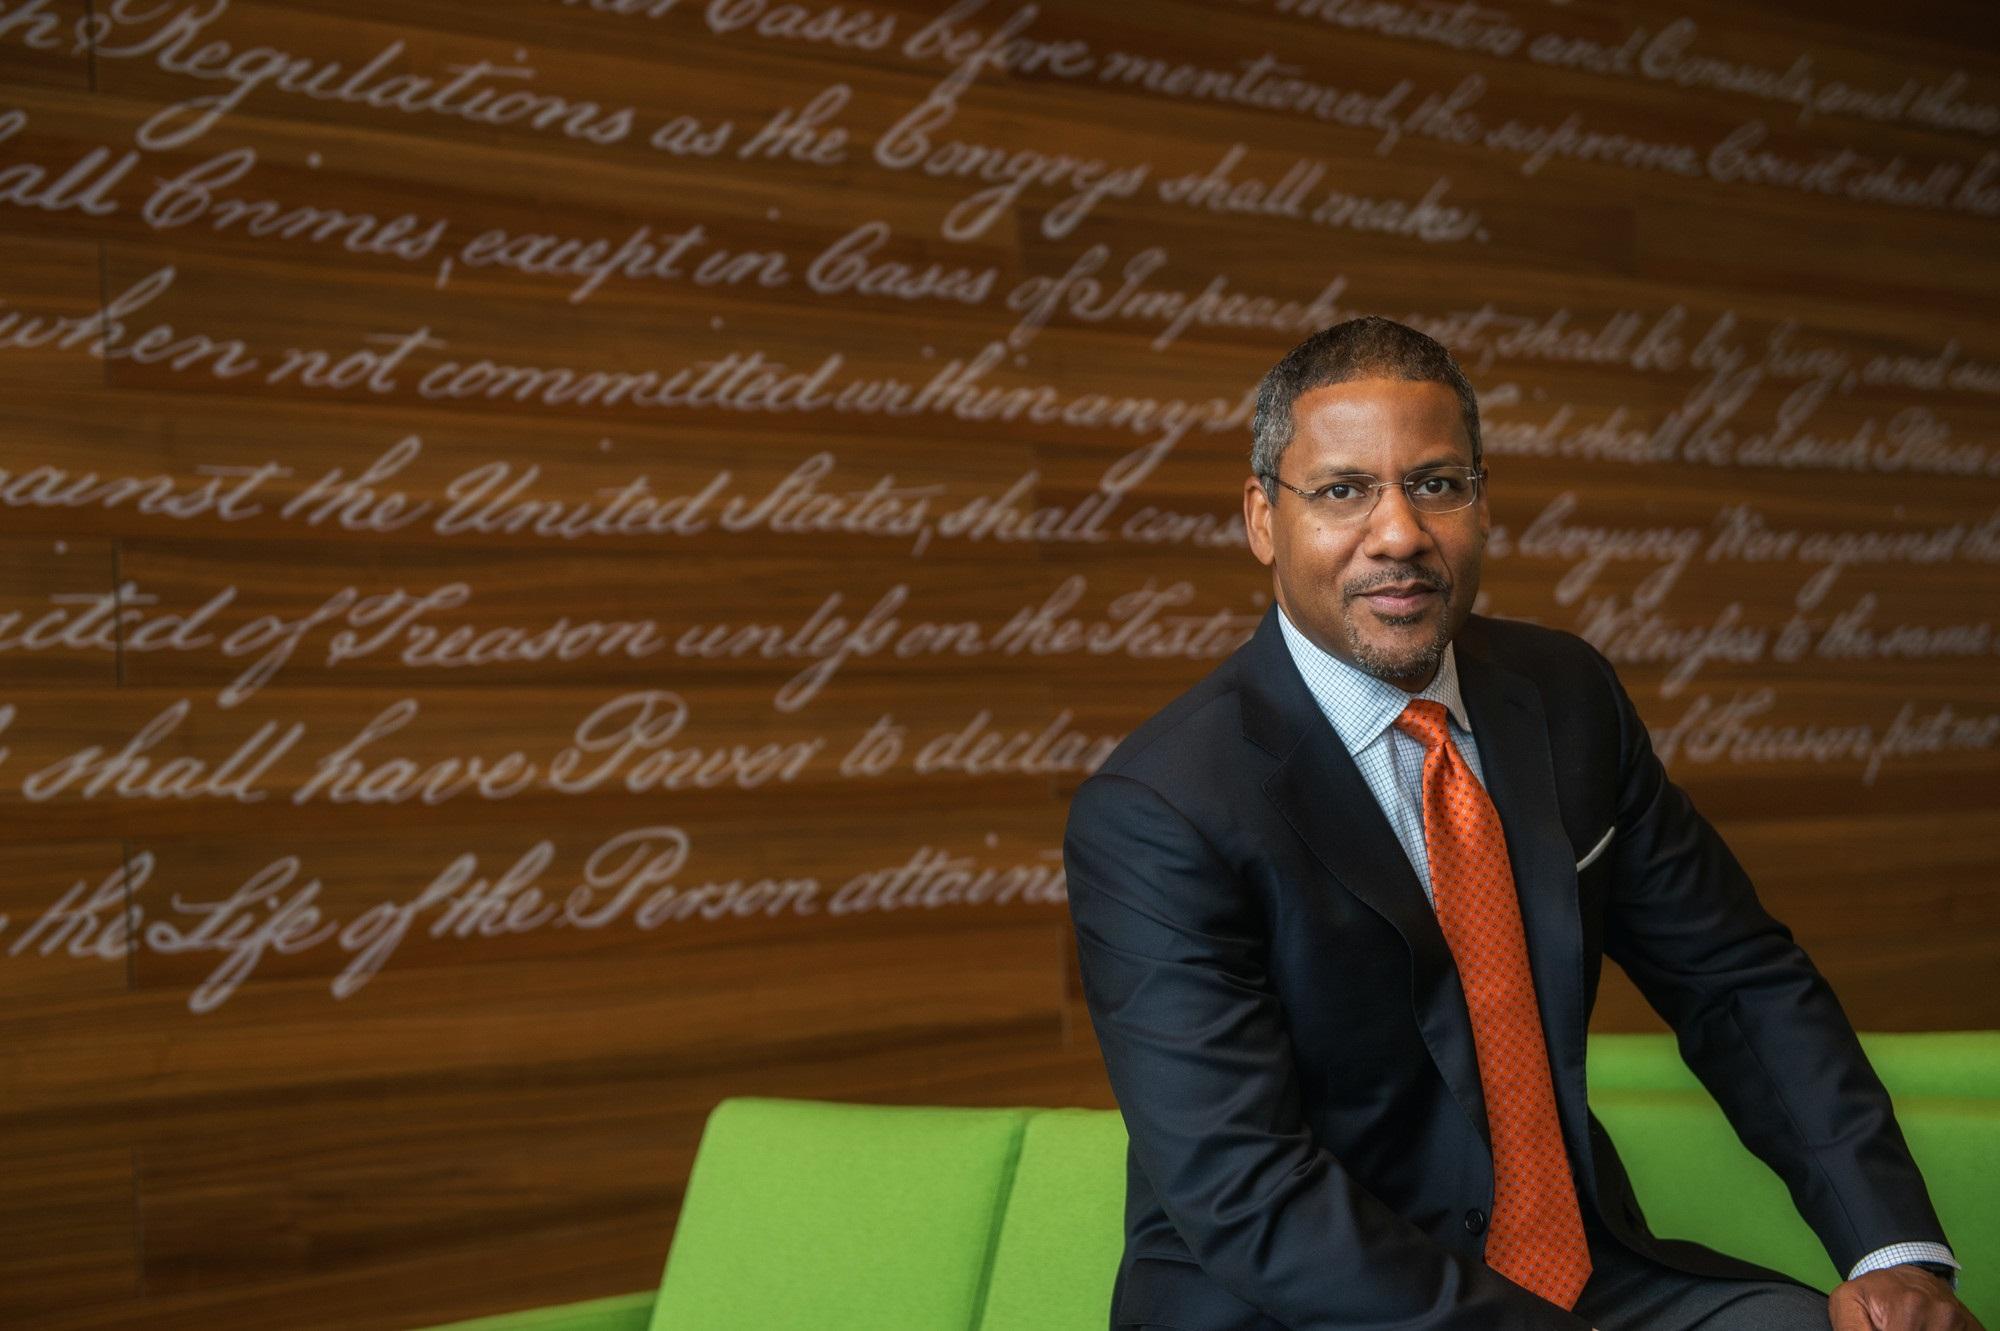 Q&A with New College of Law Dean Craig M  Boise – Syracuse